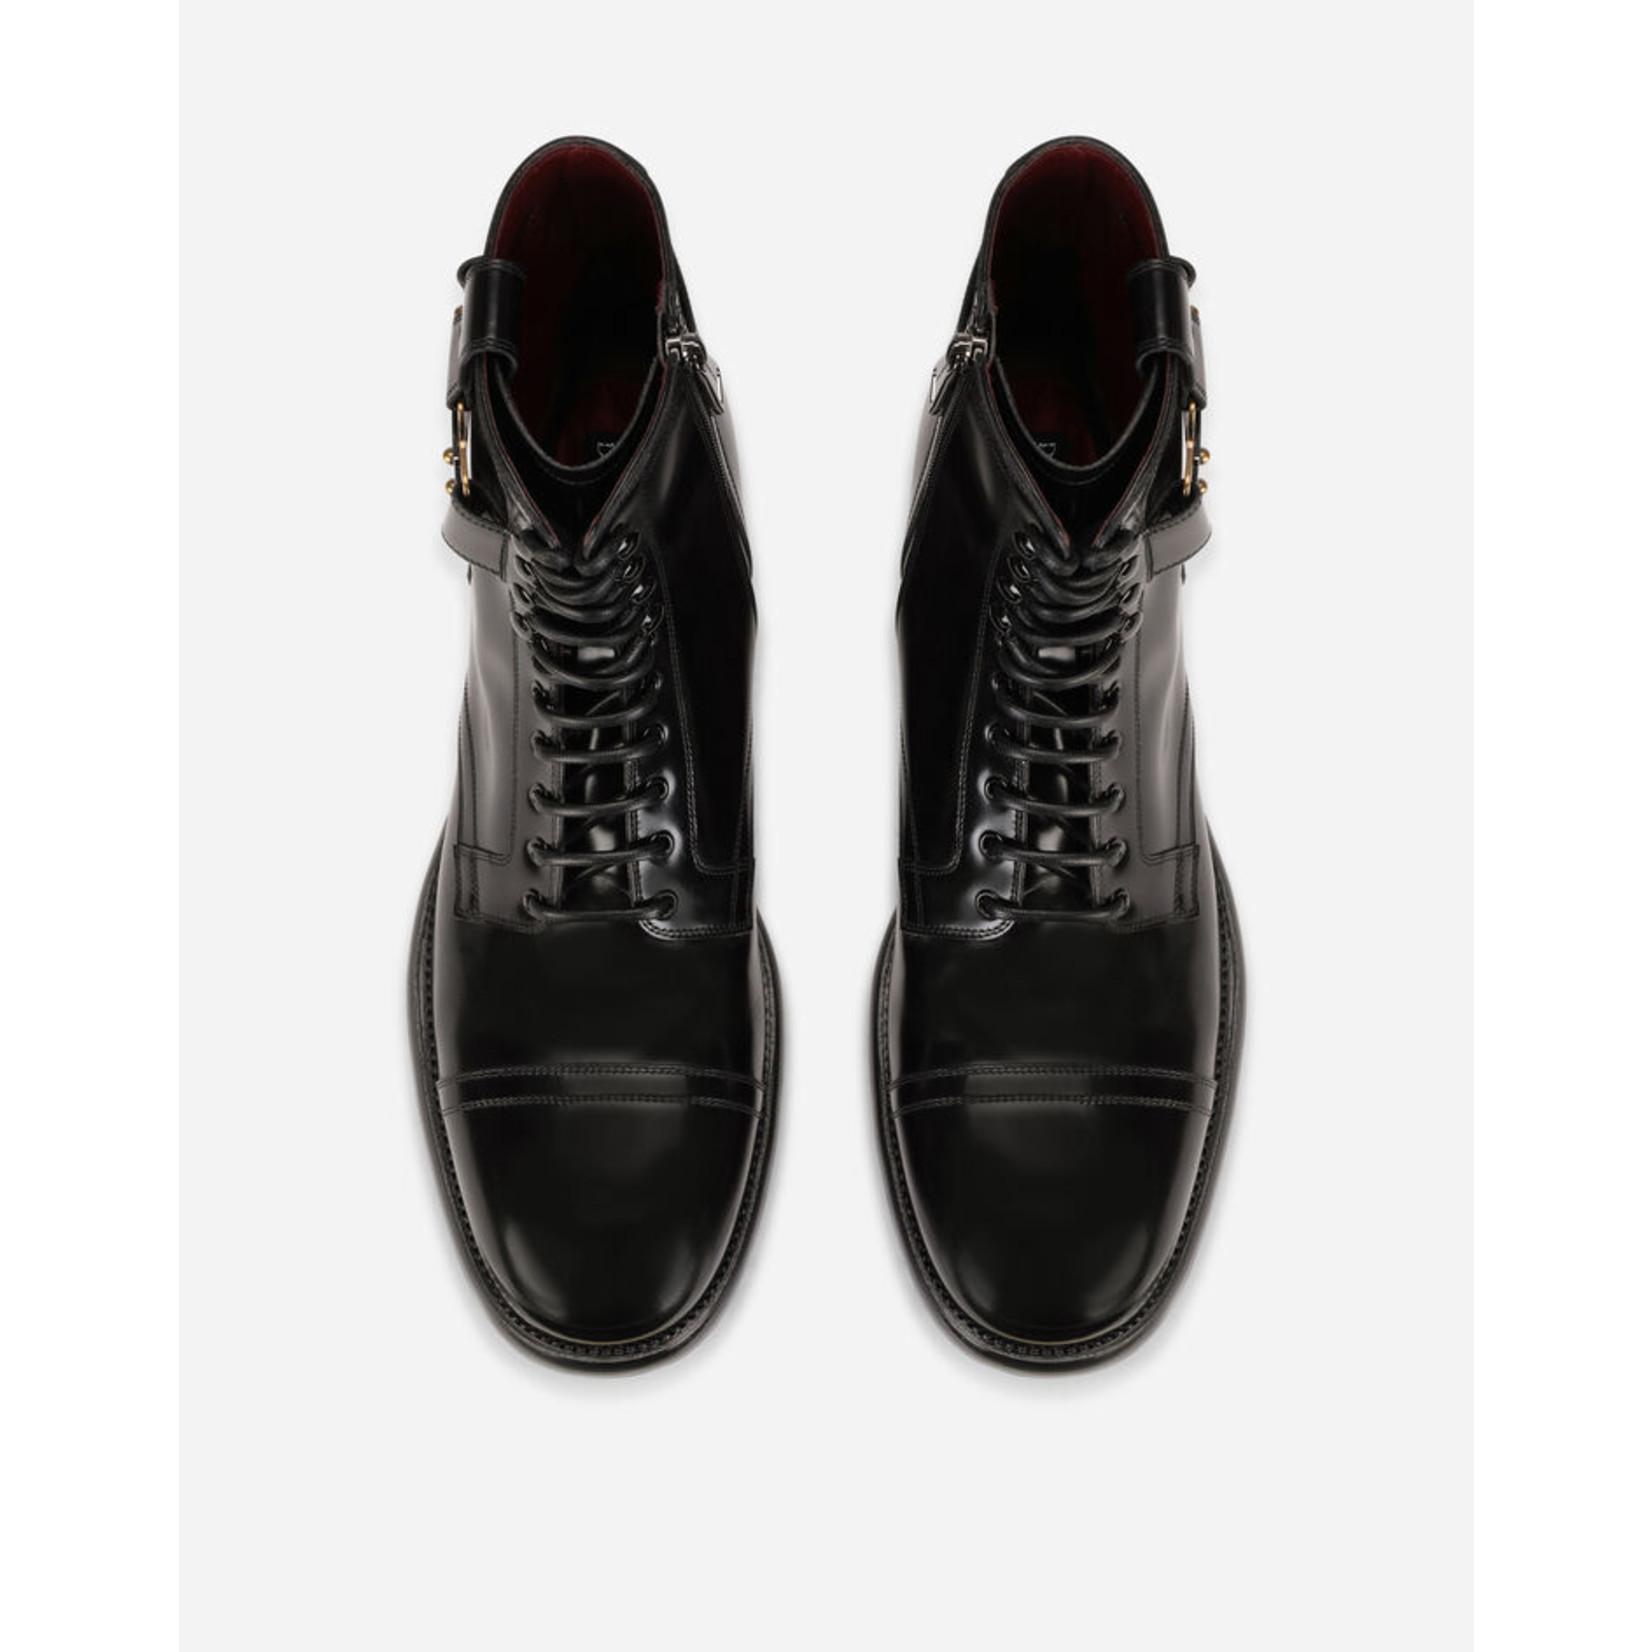 Dolce&Gabbana schoenen Laarzen 42650